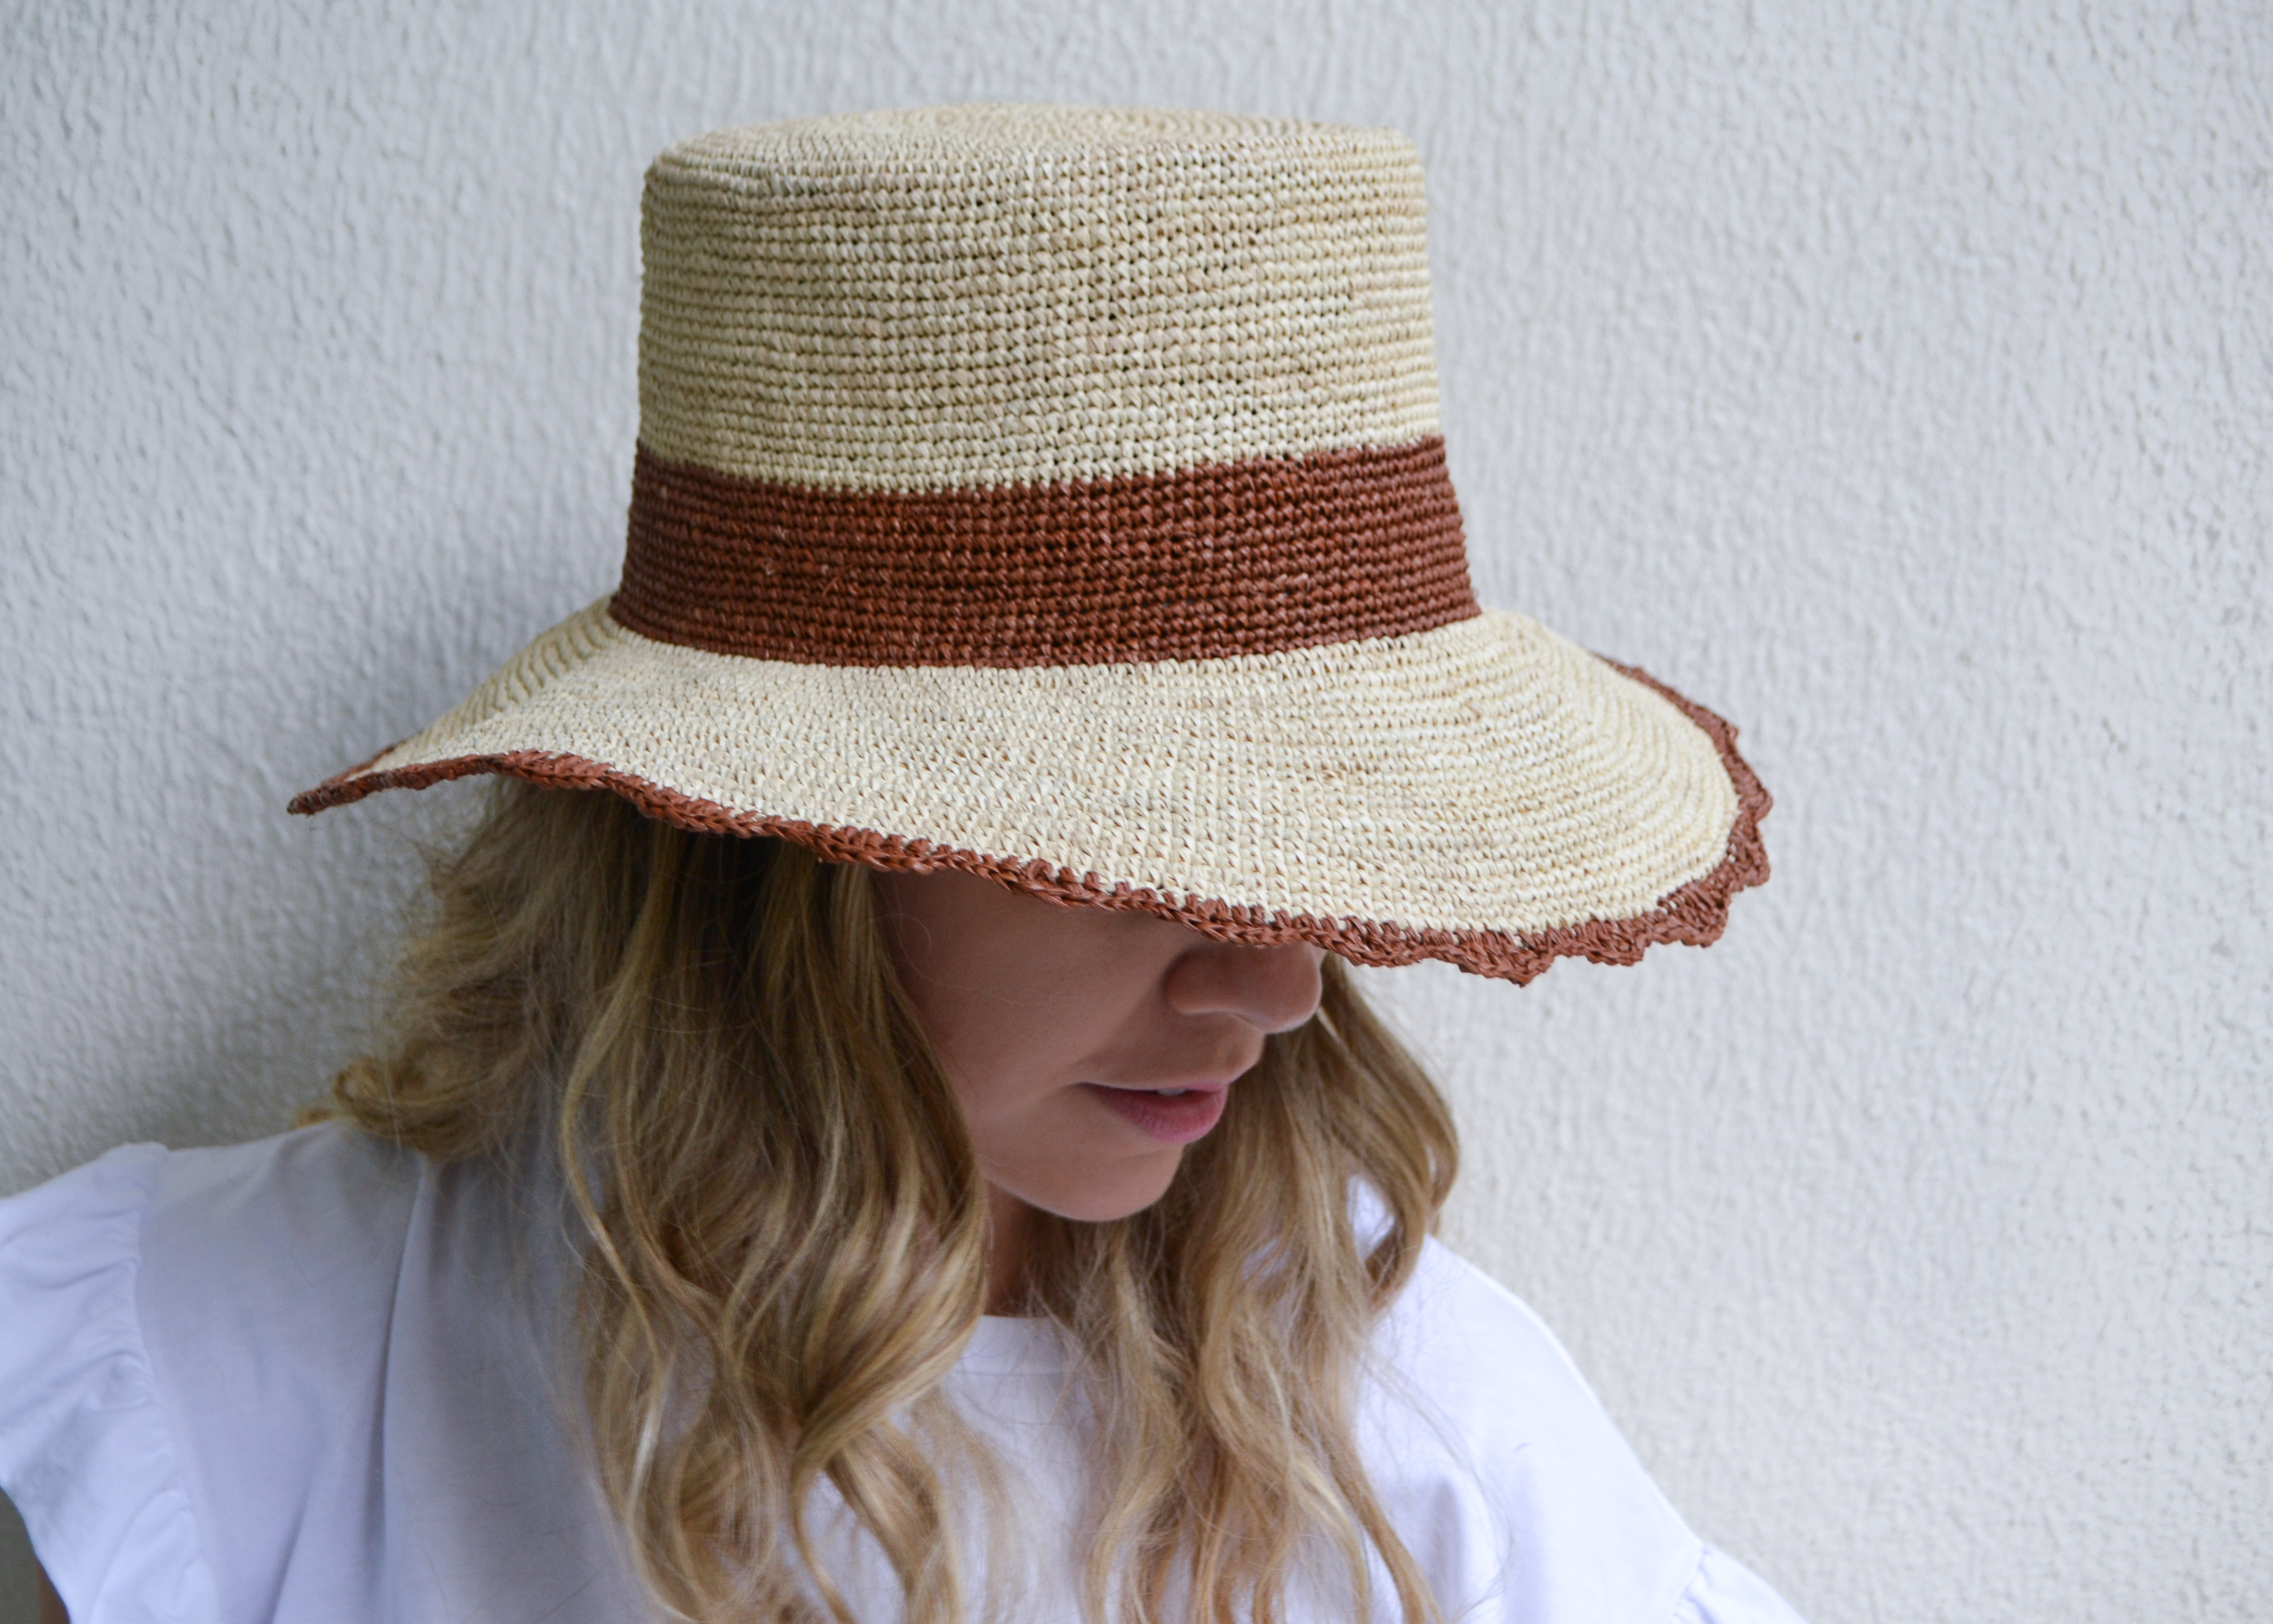 Montanita Crochet Bucket Sun Hat With Scalloped Brim By G Viteri